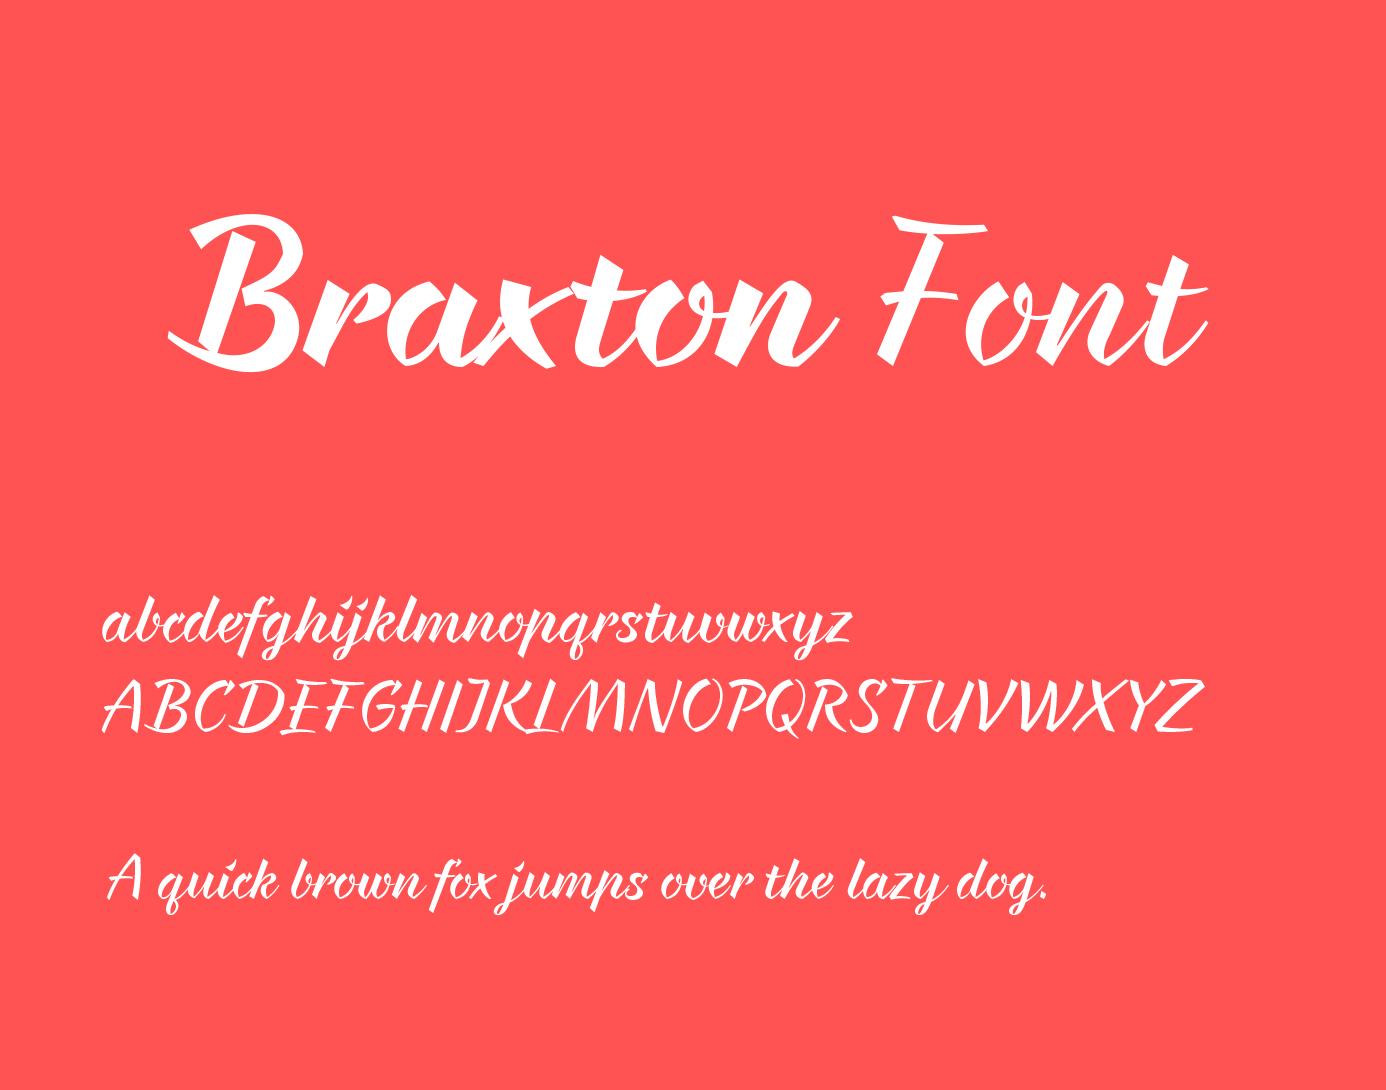 https://fontclarity.com/wp-content/uploads/2019/09/braxton-font-download-0.png Free Download